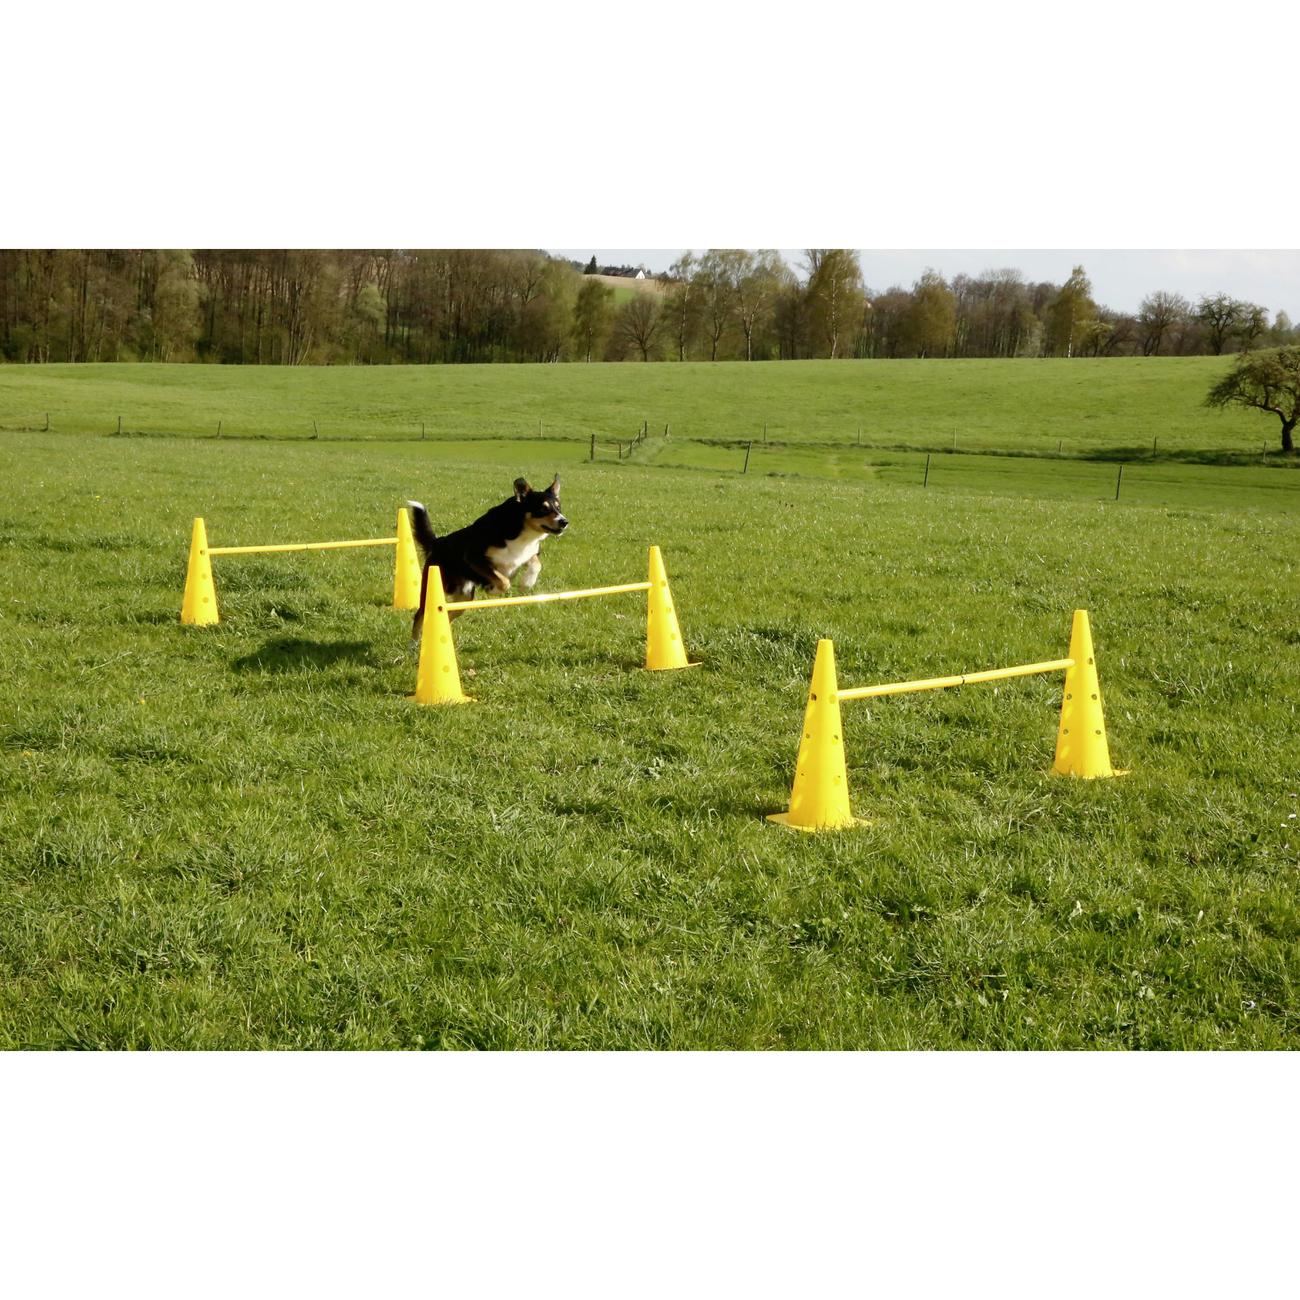 Kerbl Agility Pylonen-Hürden Set für Hunde, Bild 4